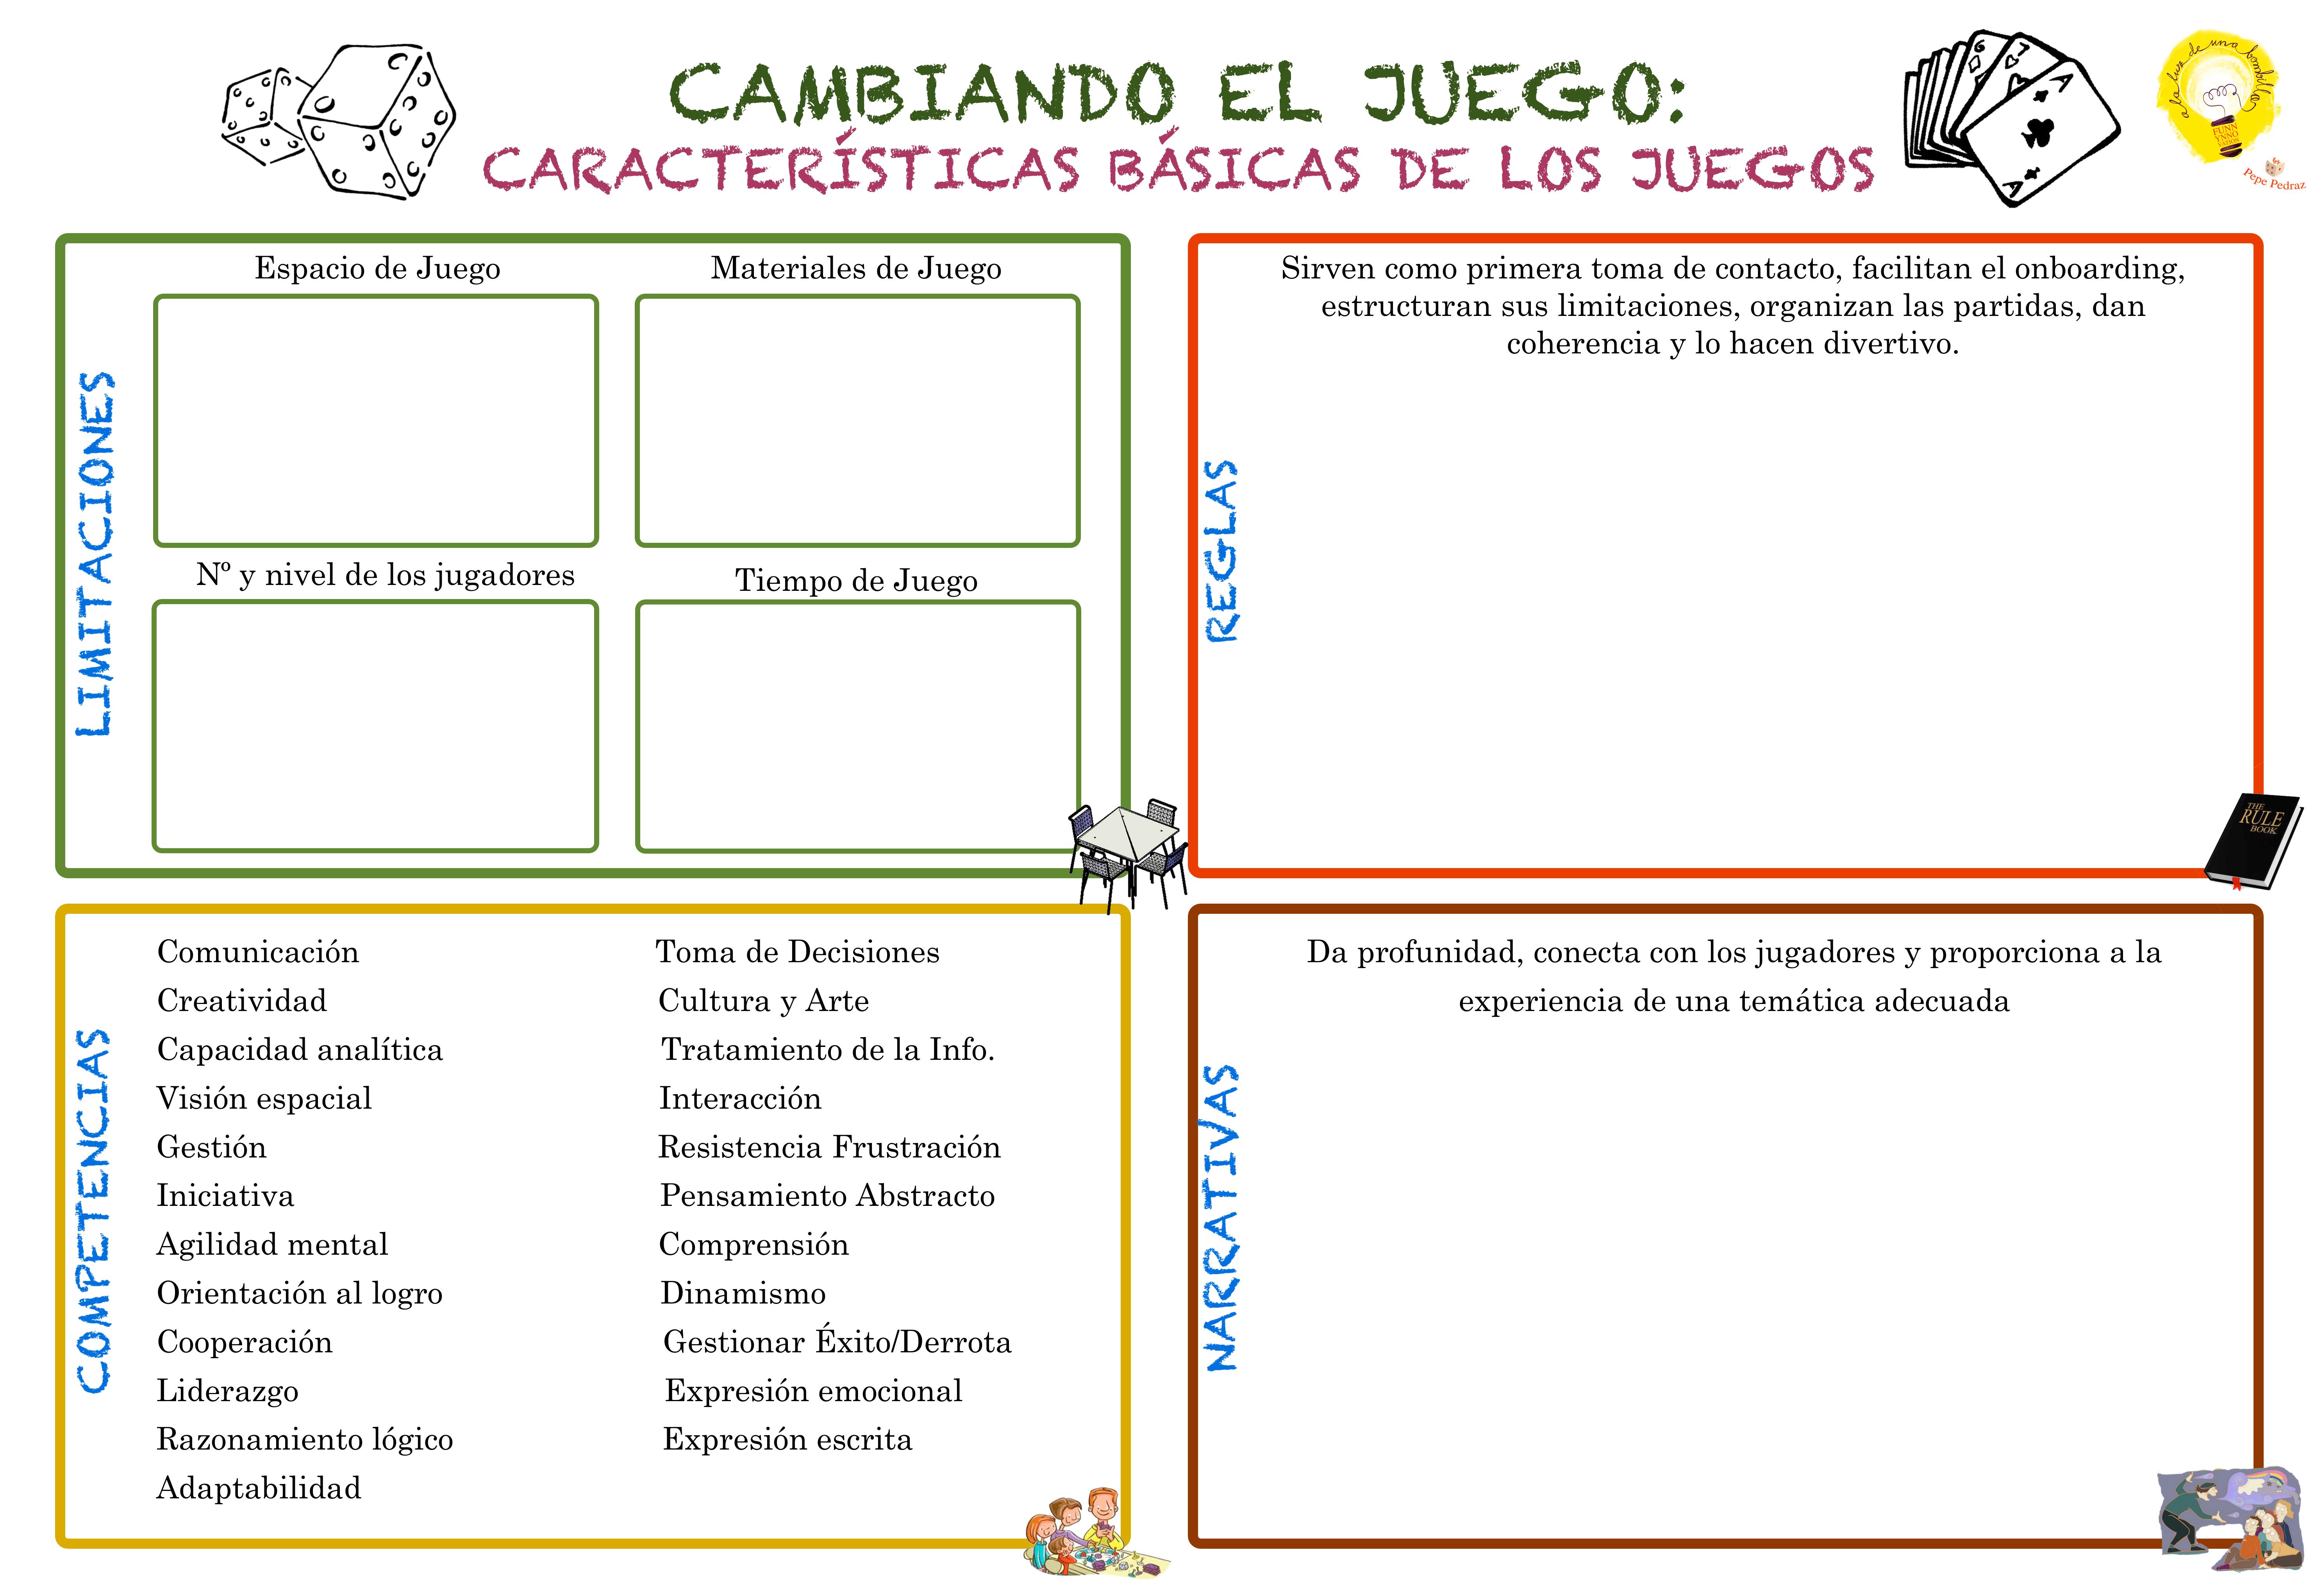 http://www.alaluzdeunabombilla.com/wp-content/uploads/2017/01/Cambiar-y-deconstruir-Juego.jpg